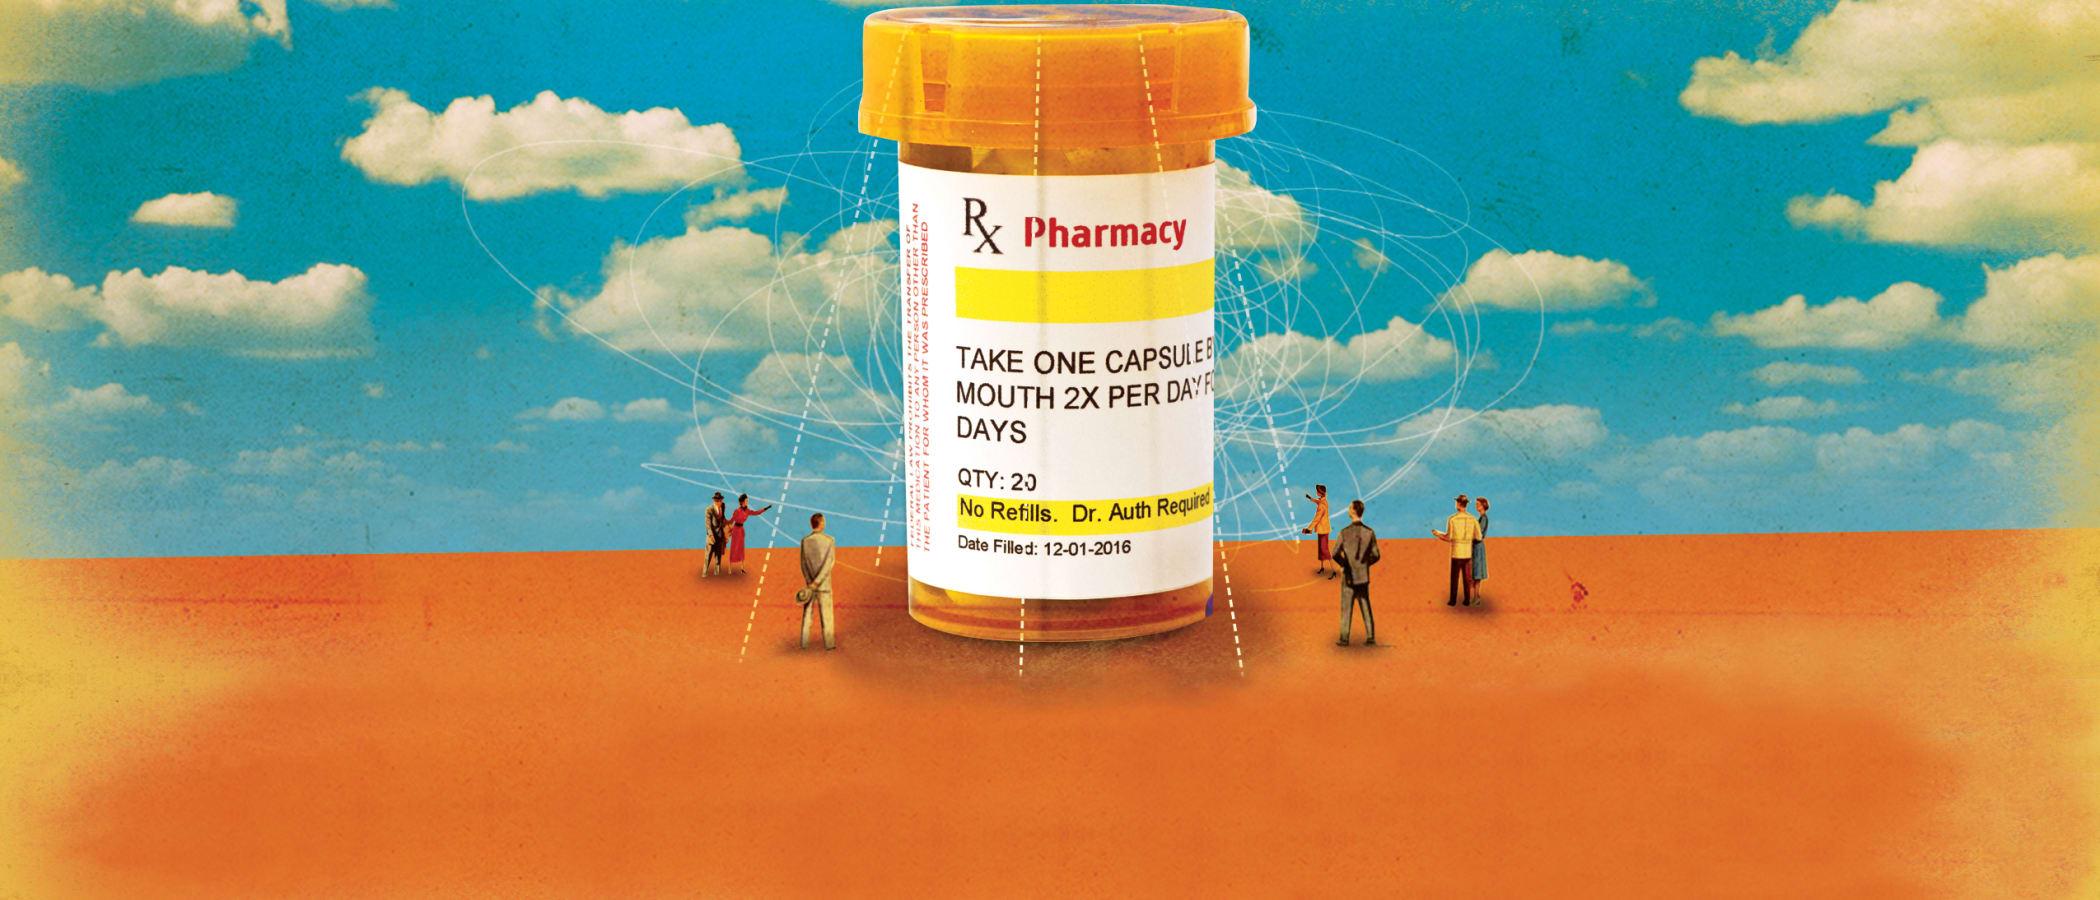 How HR Can Help Control Prescription Drug Costs